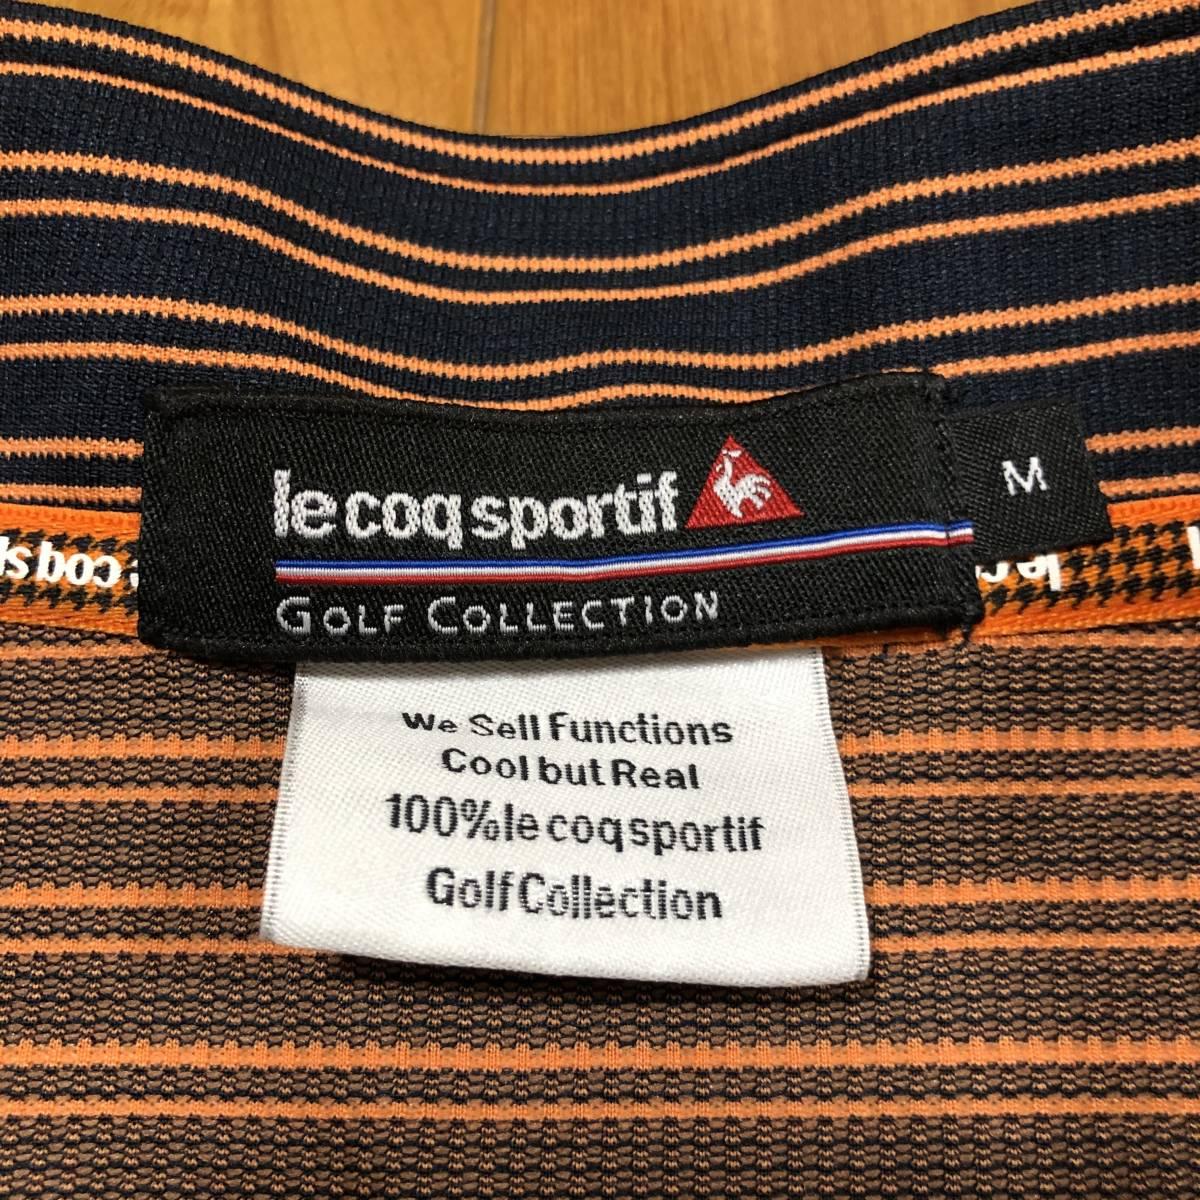 【le coq sportif golf】 ルコック ゴルフ ゴルフウェア 半袖 ハーフジップ ポロシャツ メンズ Mサイズ 美品!_画像3